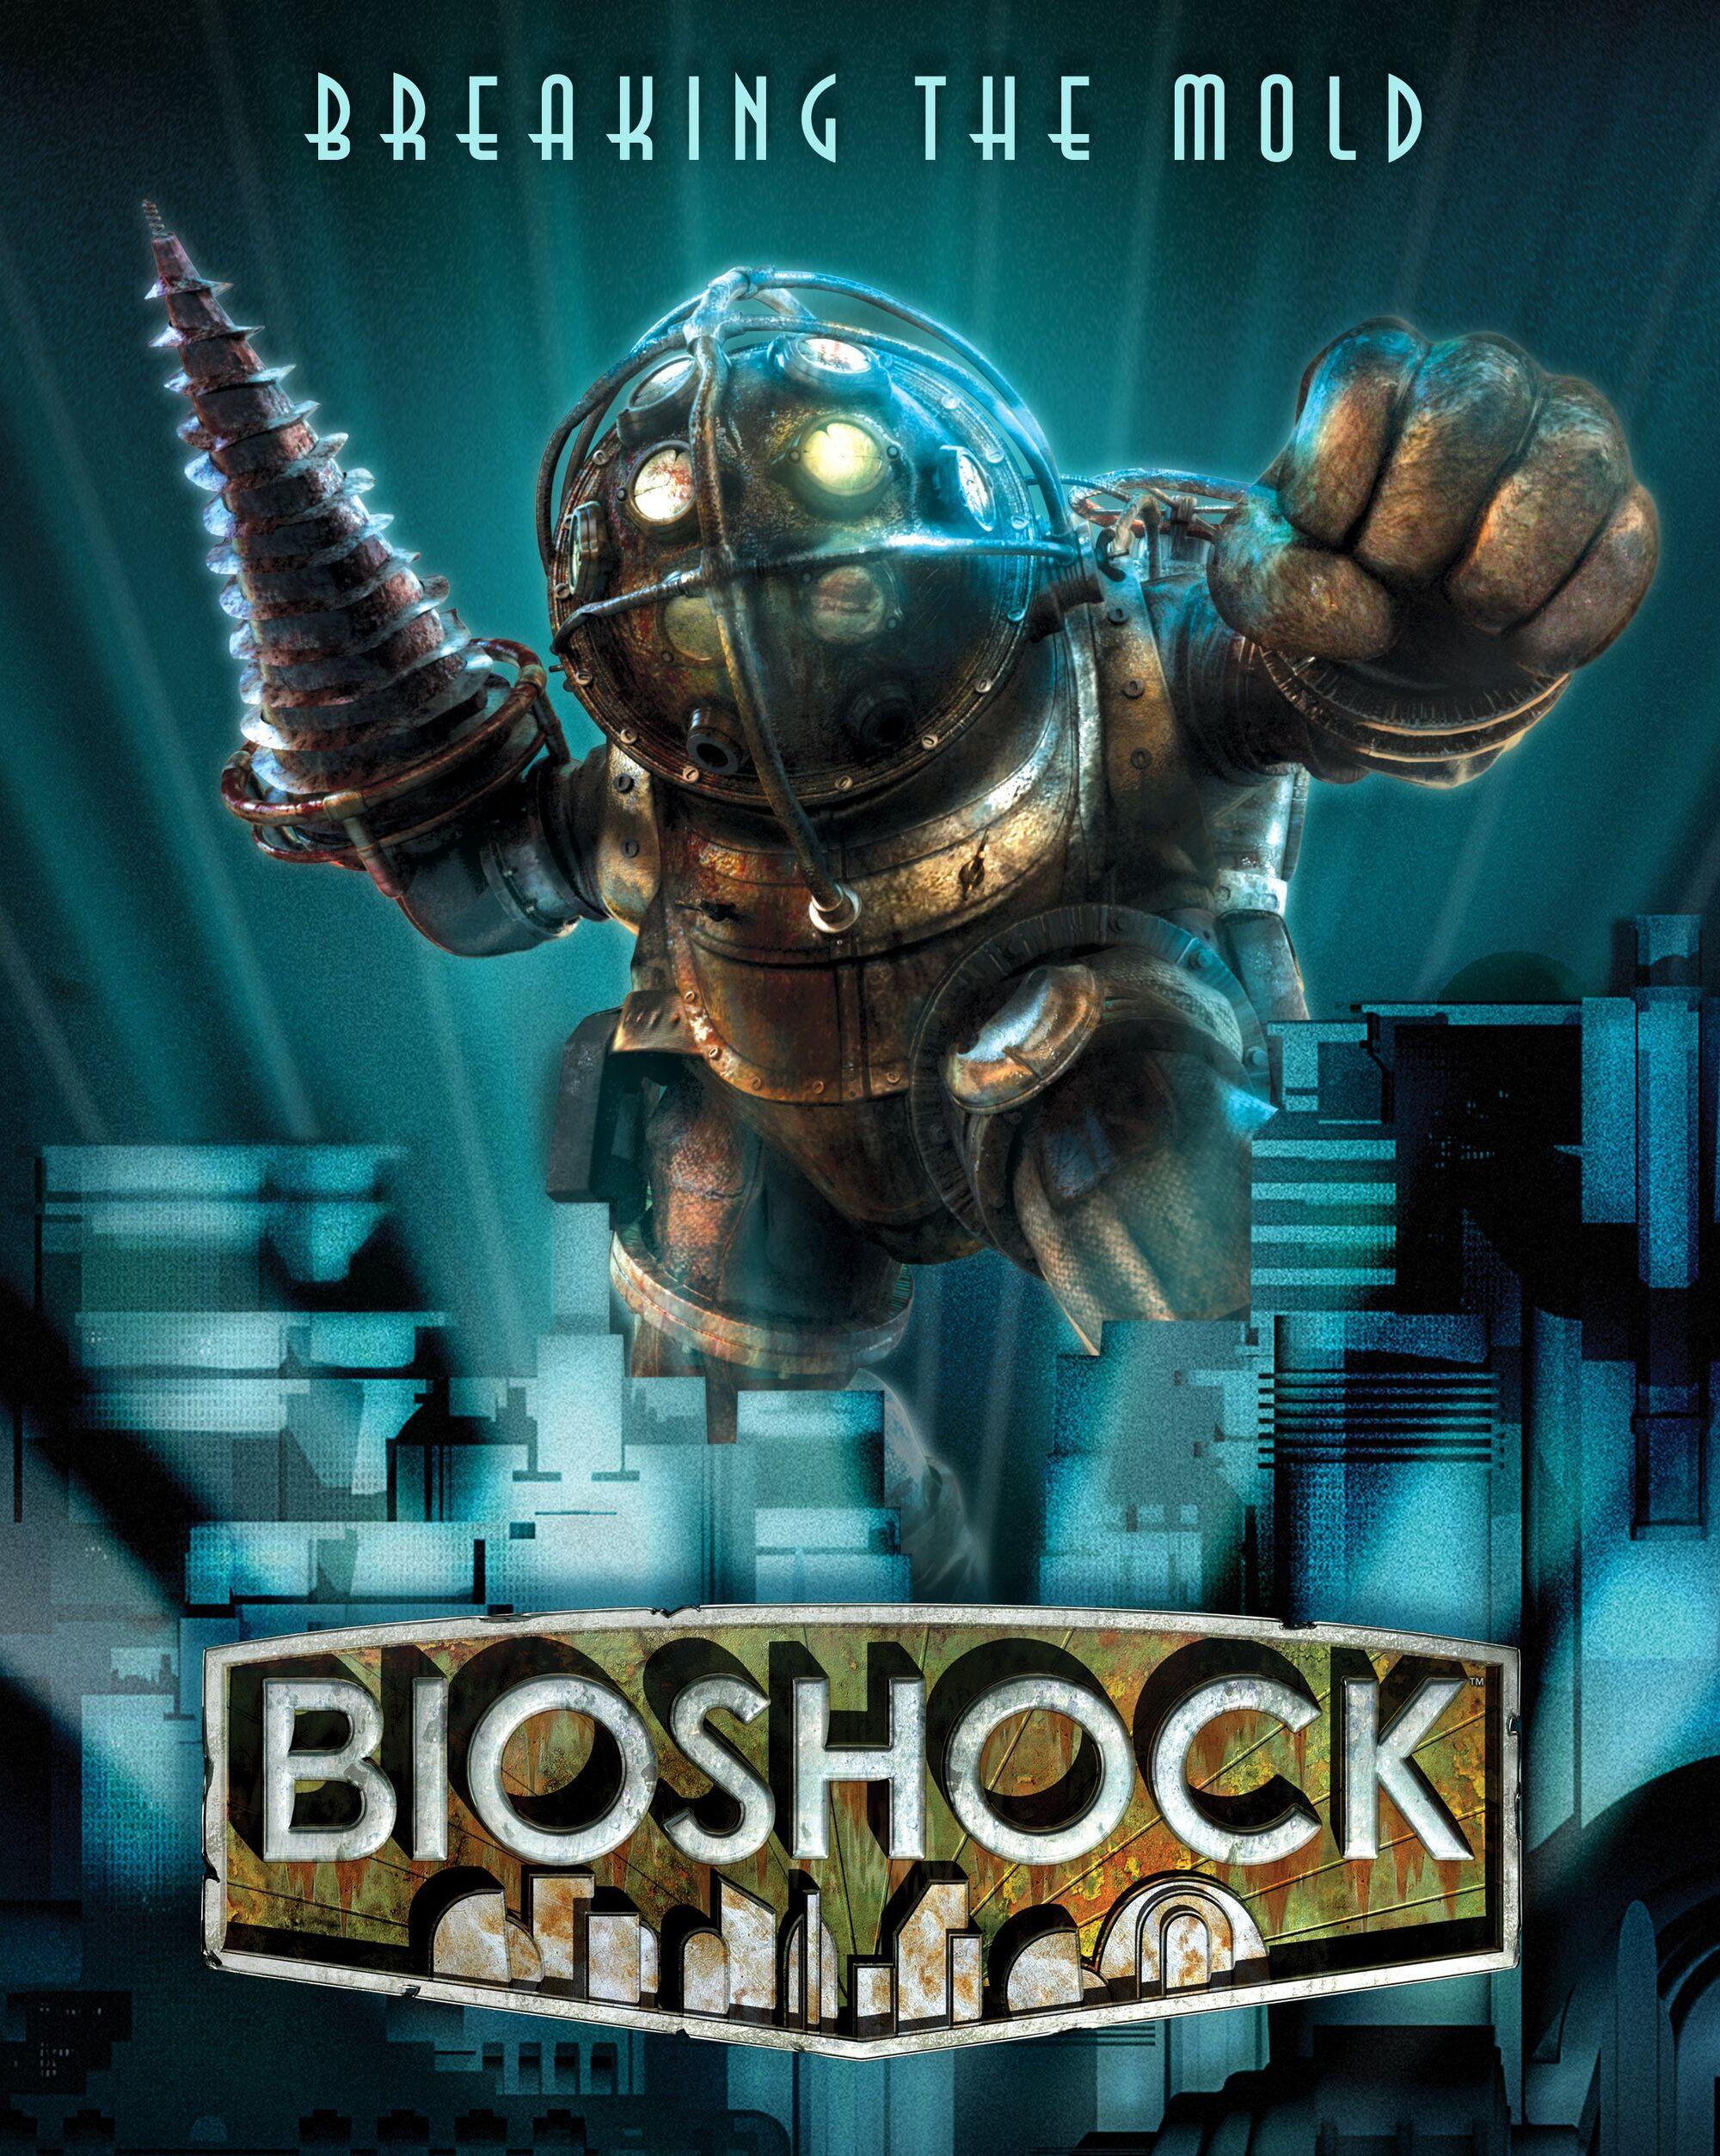 Bioshock breaking the mold bioshock wiki fandom - Bioshock wikia ...